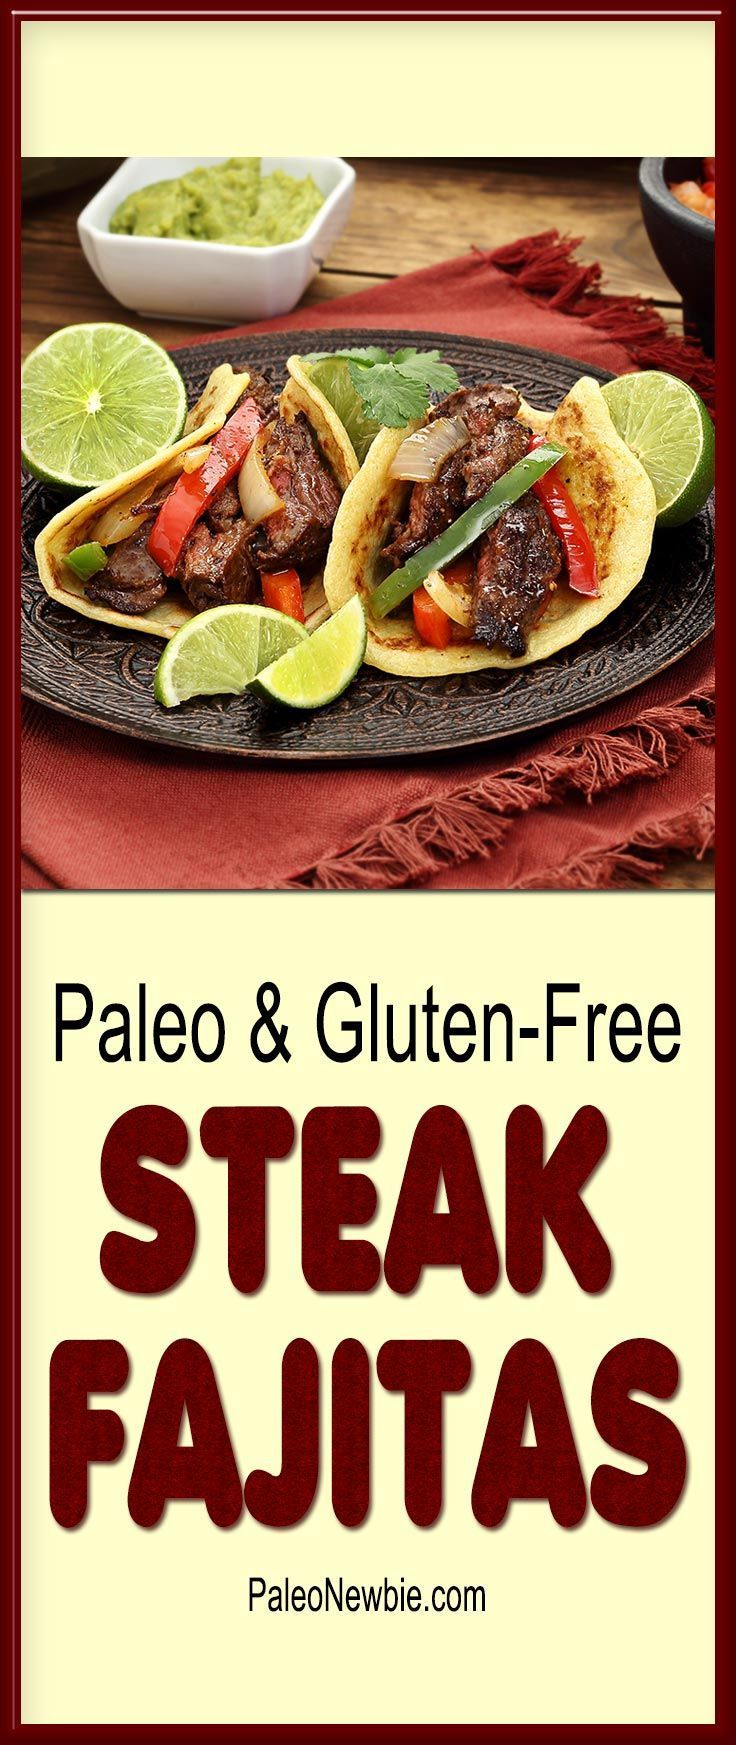 Steak Fajitas with Paleo Tortillas Happy Cinco de Mayo everyone! You'll love this hearty and ... #steakfajitarecipe